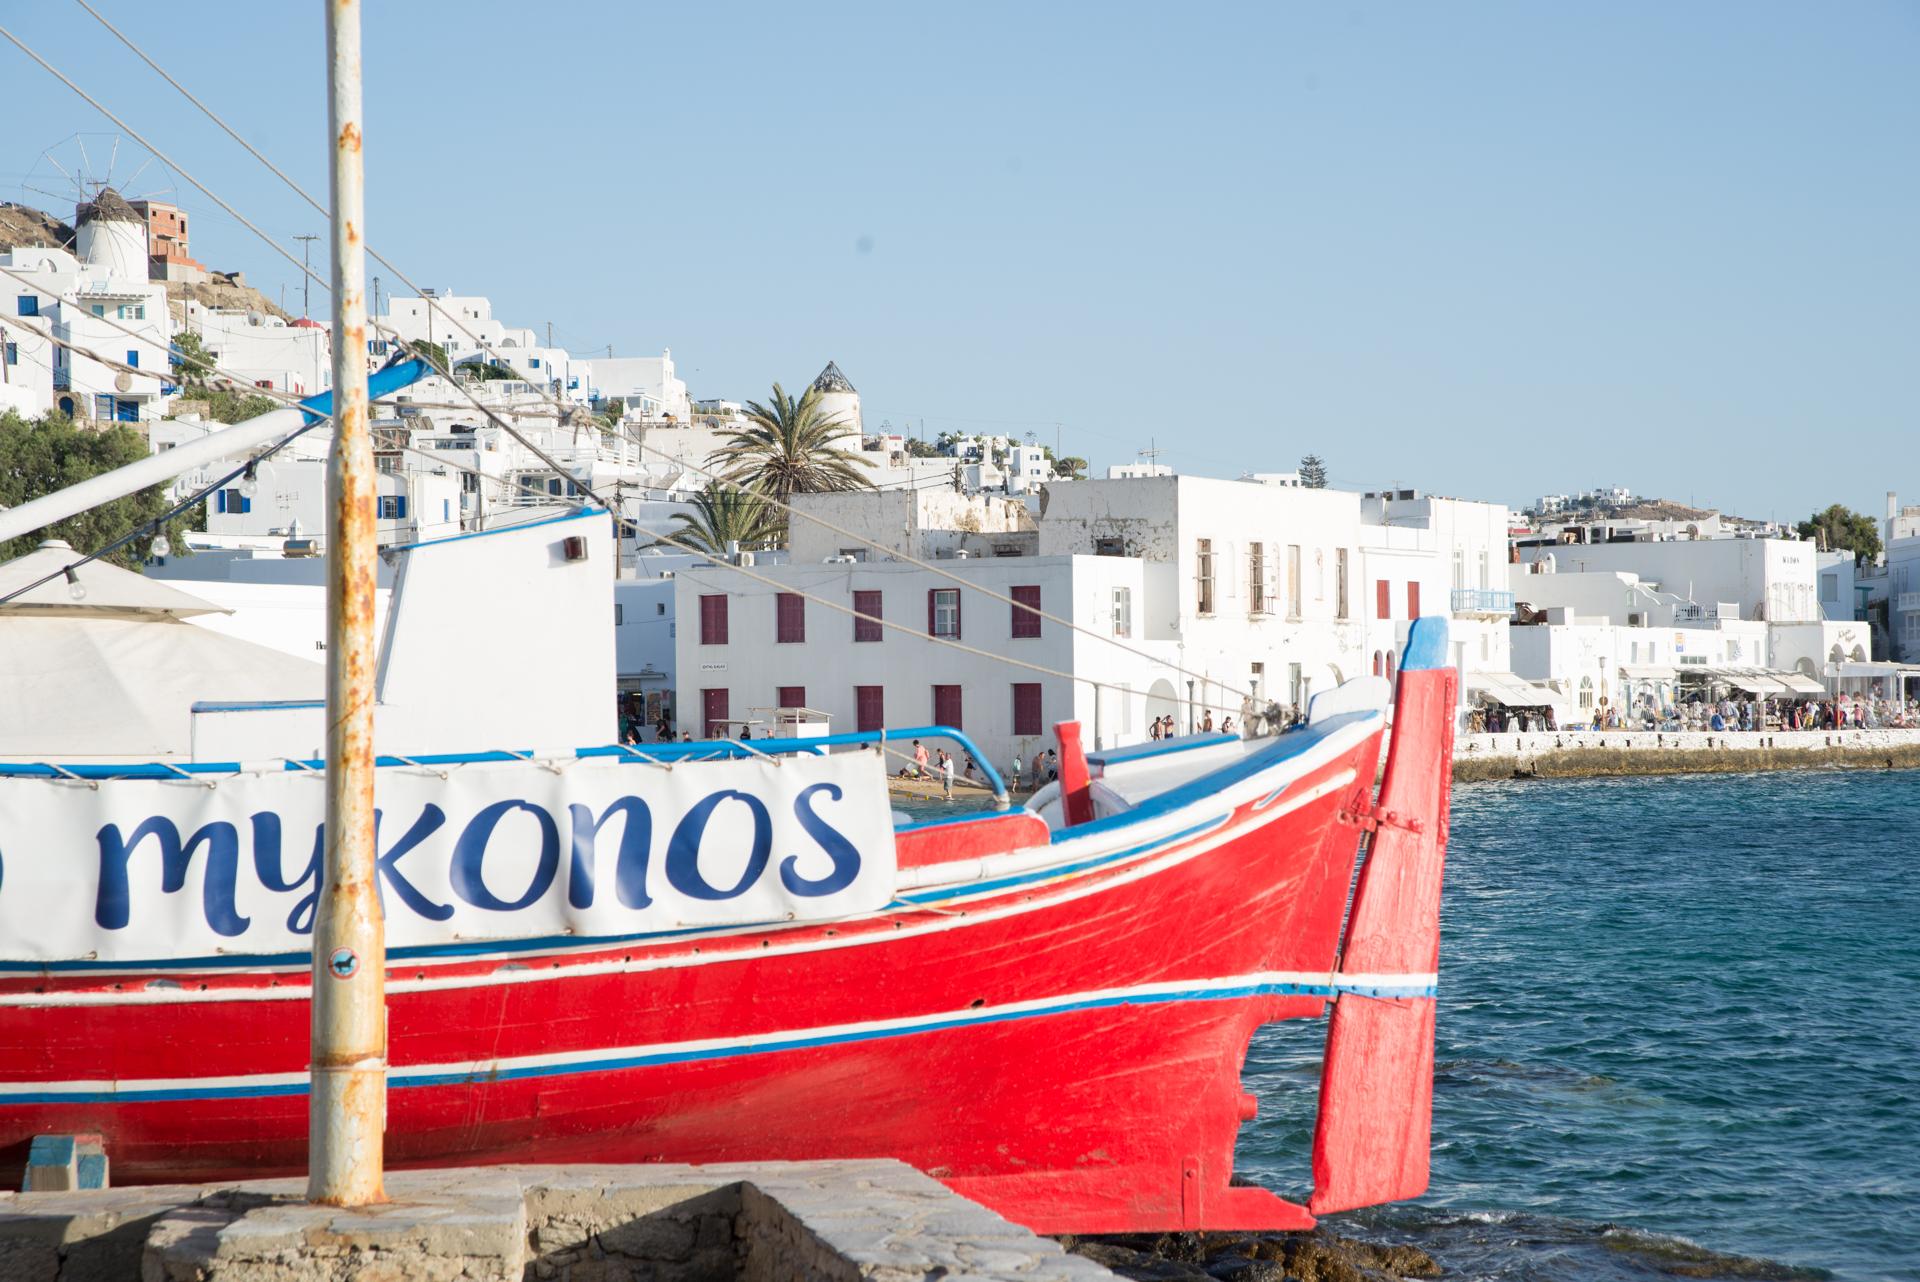 Mykonos 3 day itinerary